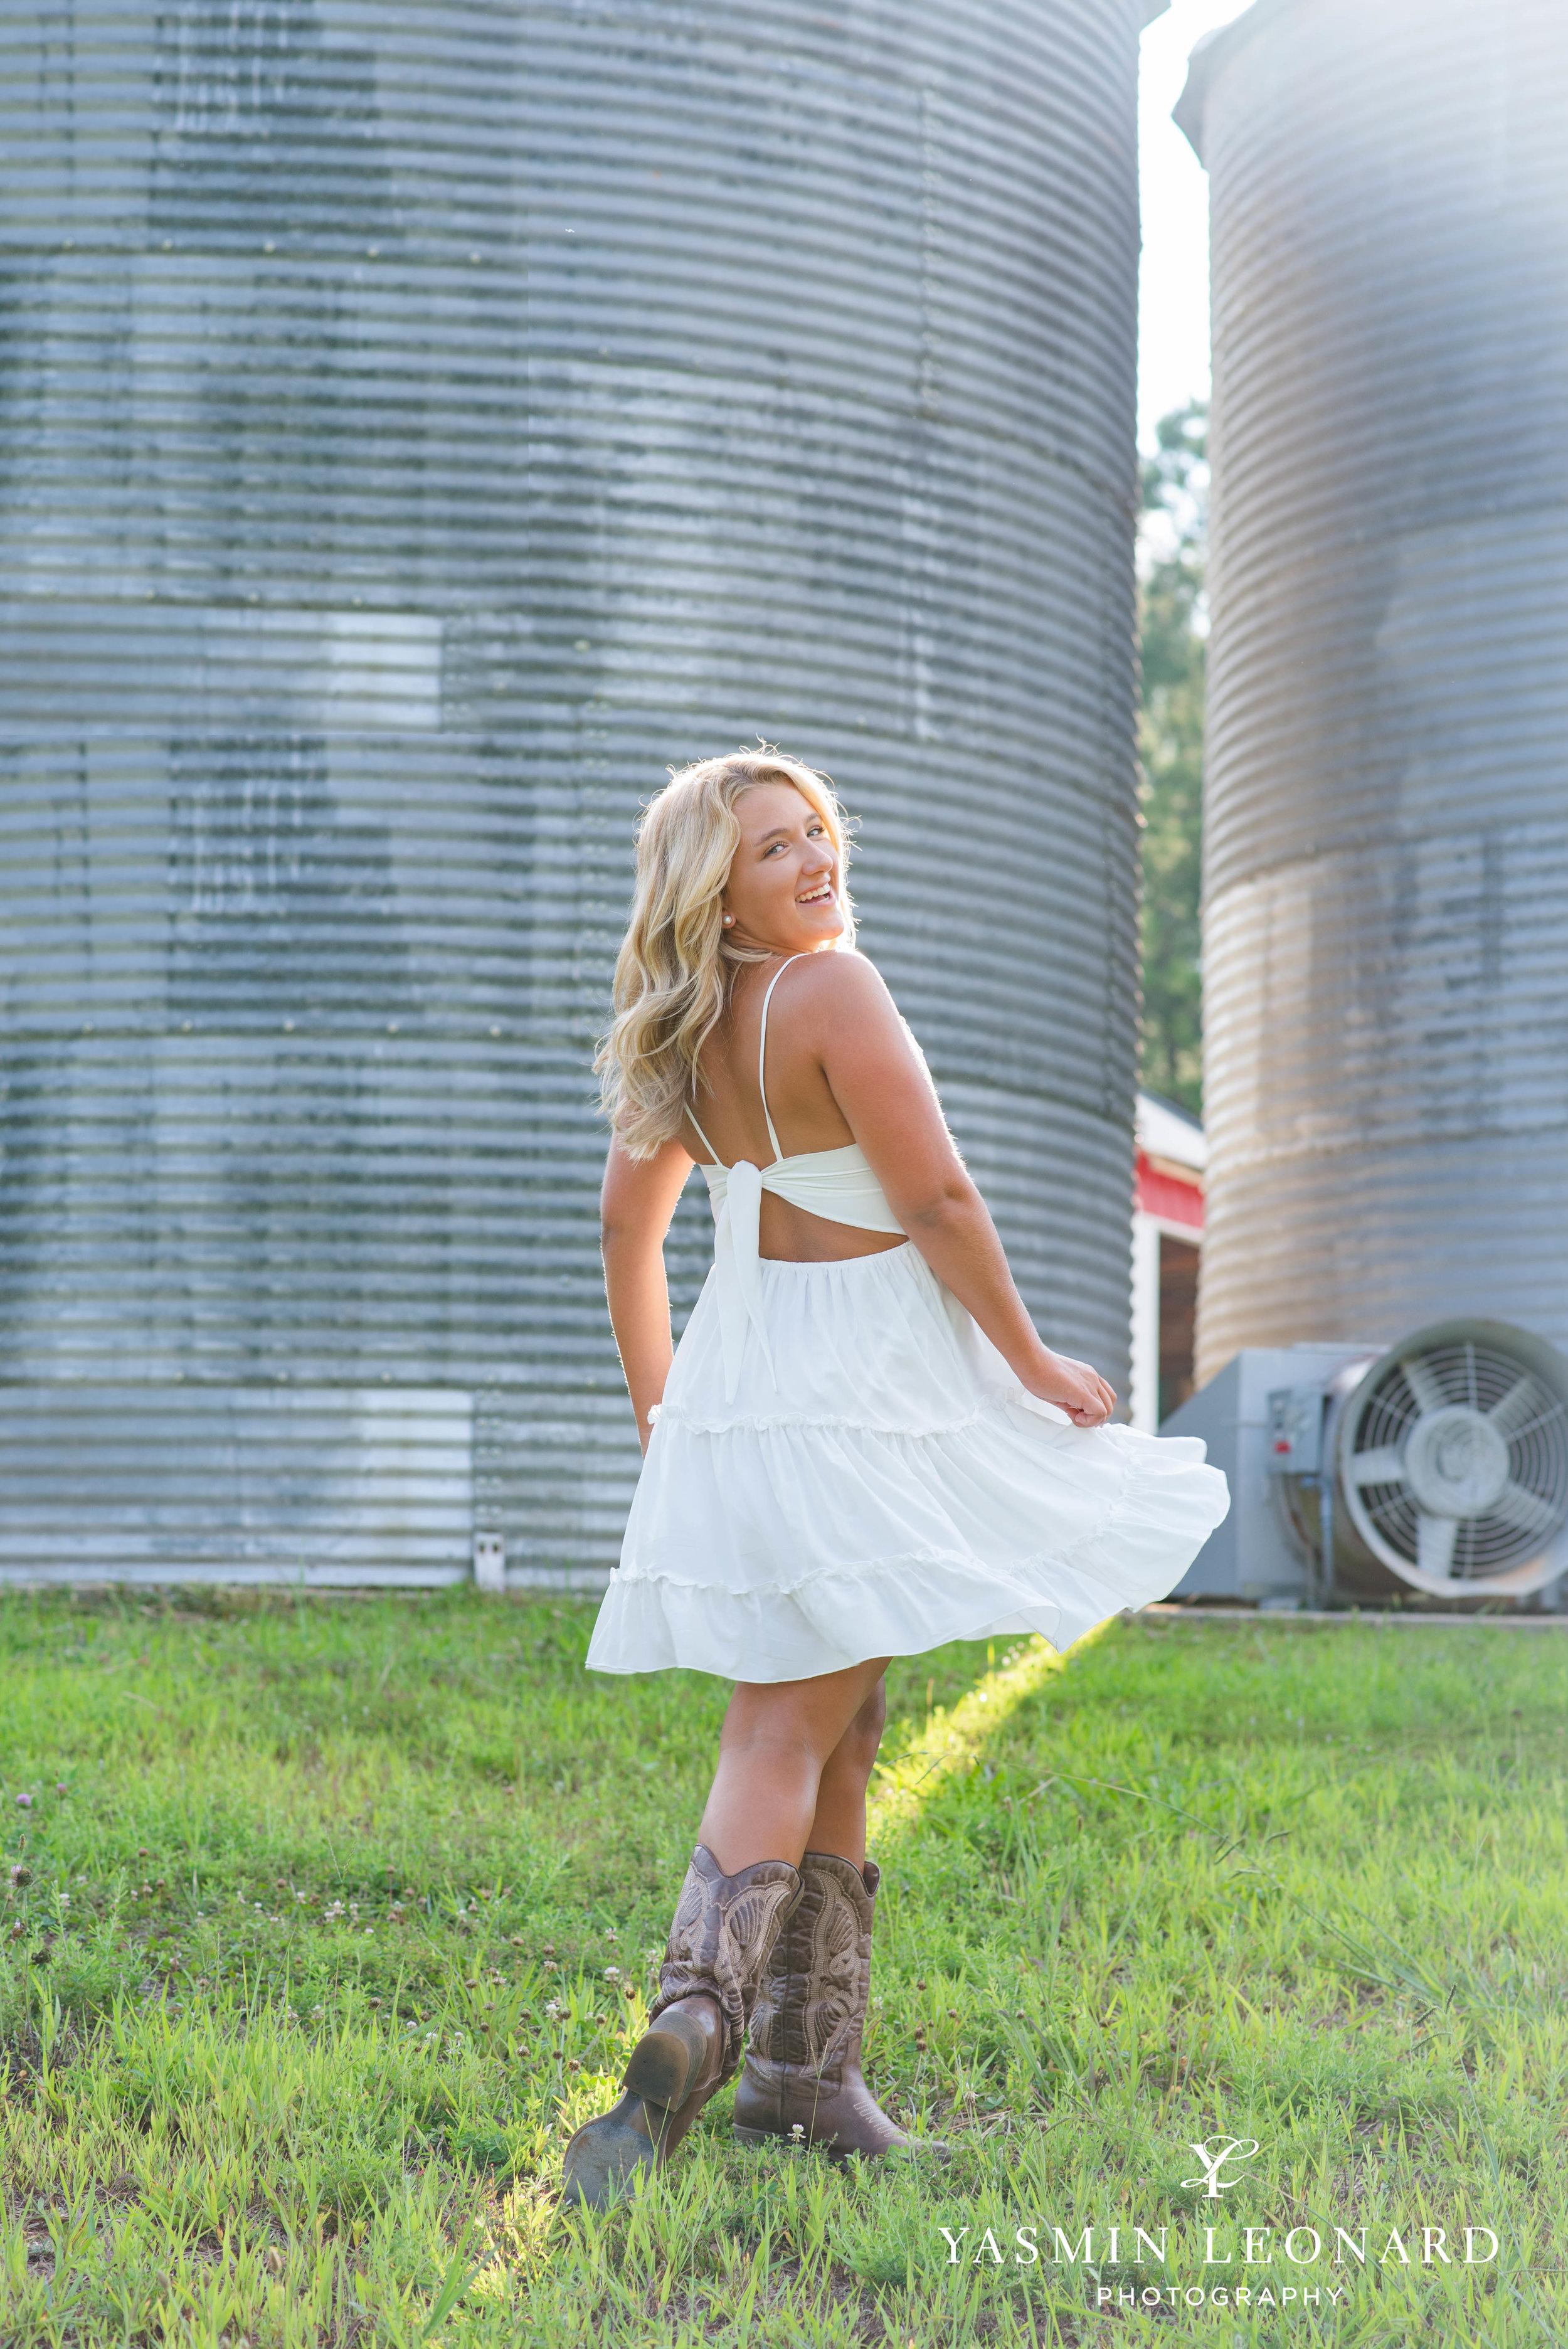 Senior Poses - Girl Senior Poses - Country Senior - Tractor with Senior - Tanglewood Senoir Portratis - Summer Senior Portrait Outfits - Yasmin Leonard PHotography-5.jpg